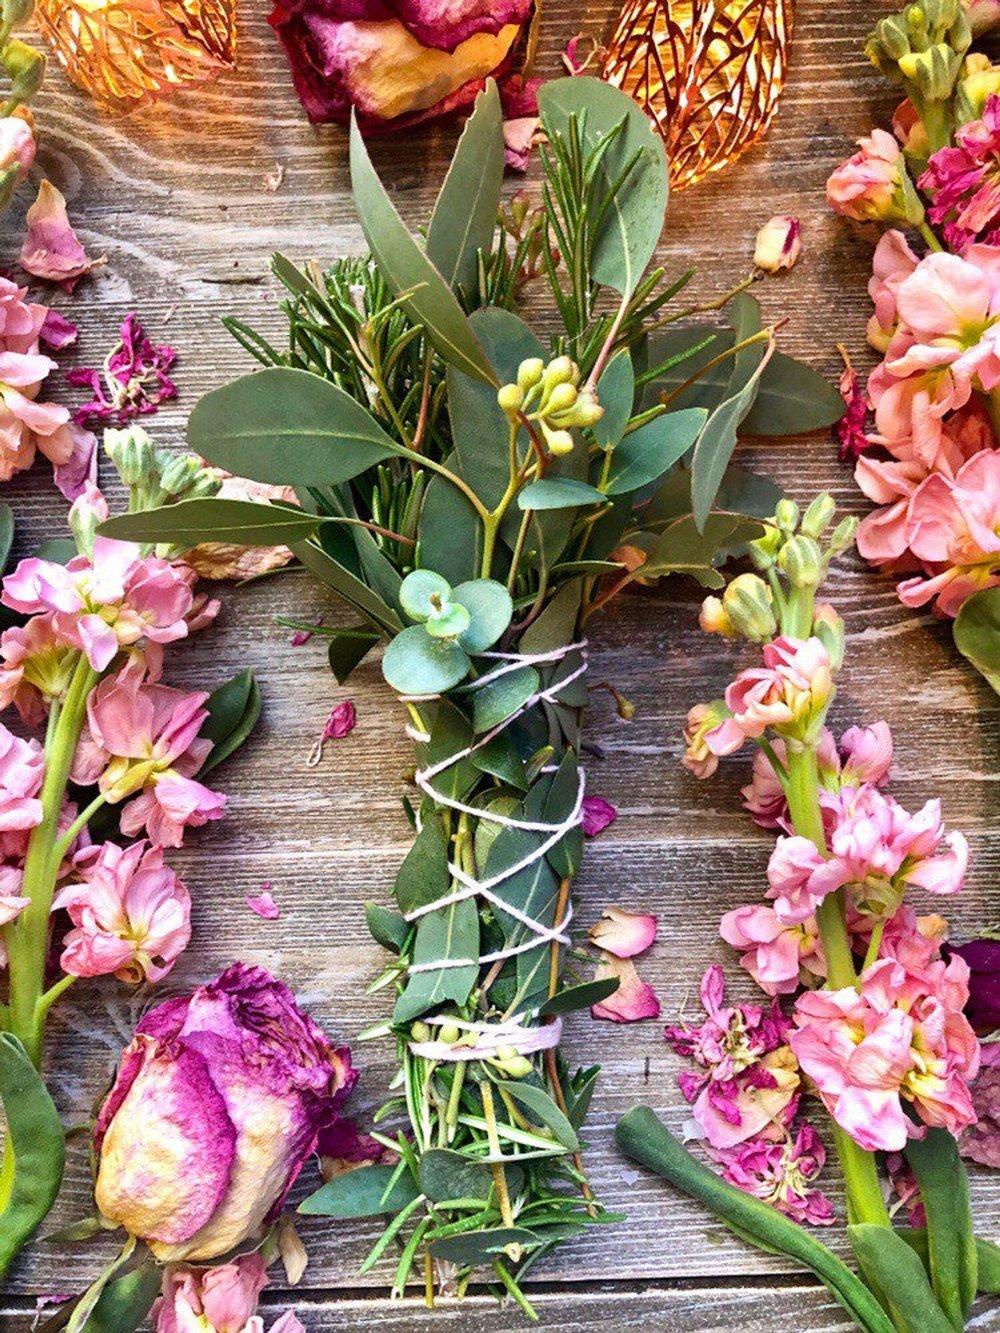 Floral Smudge